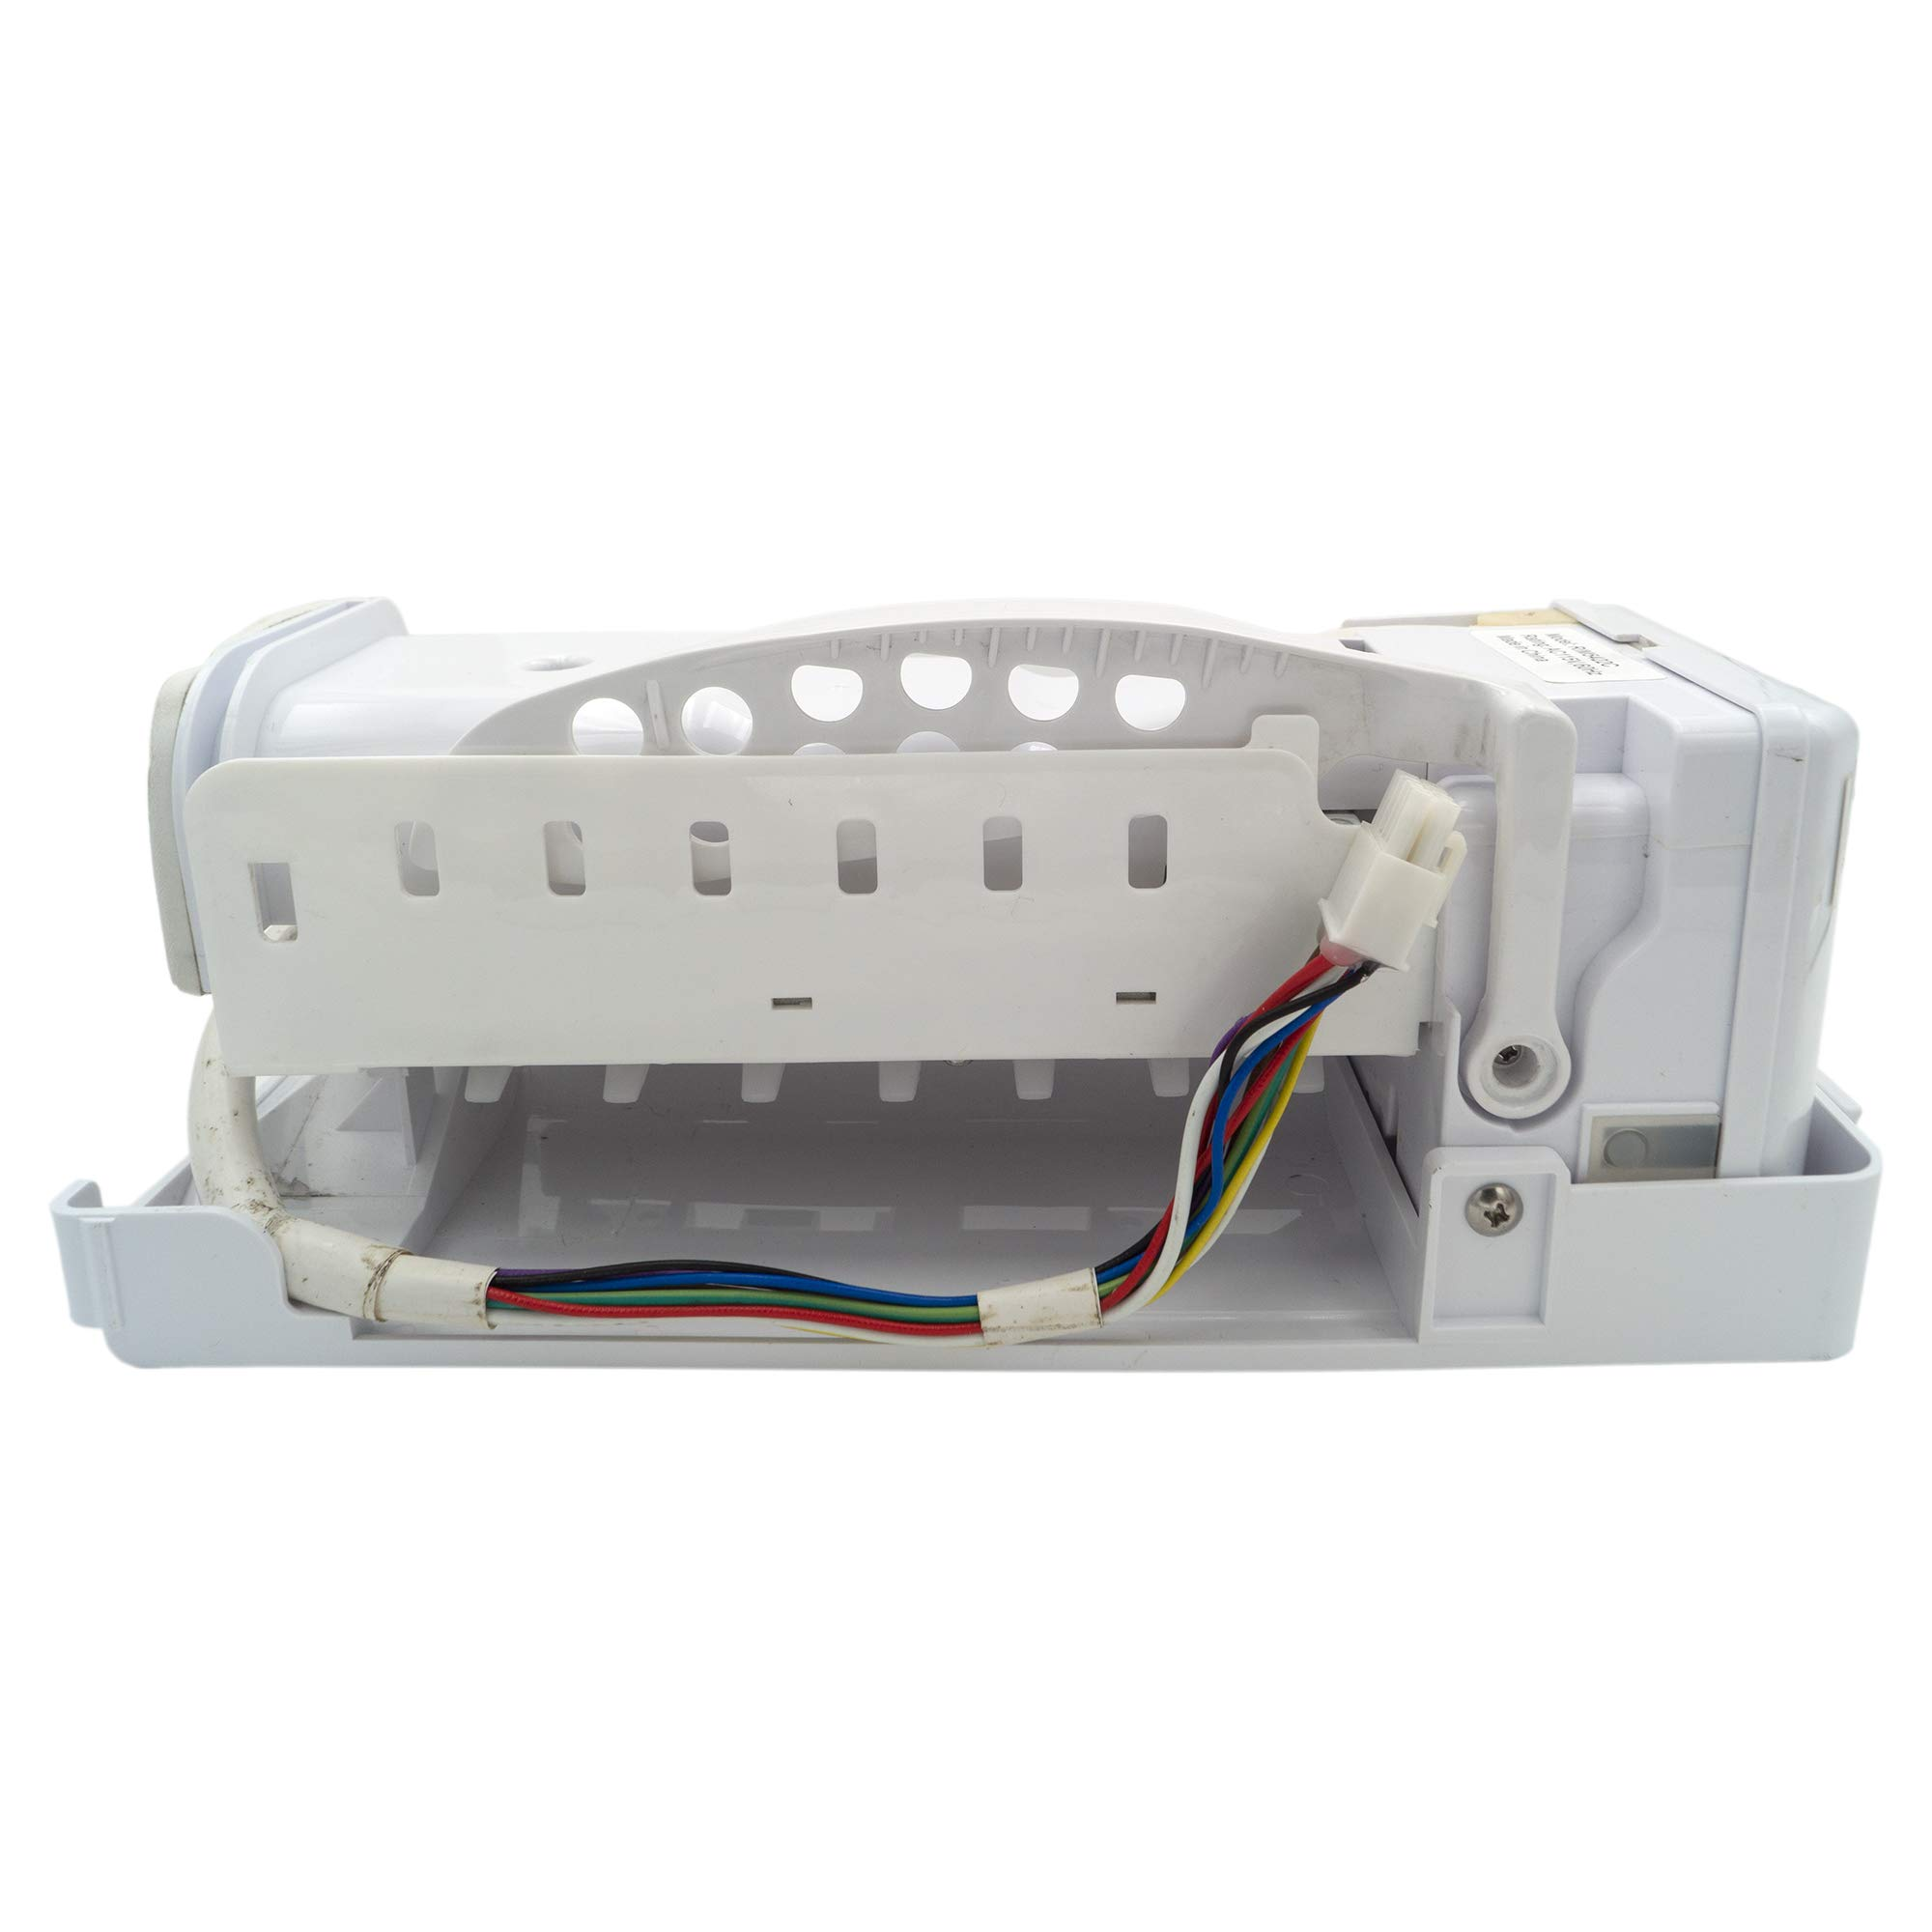 Supplying Demand DA97-05422A Refrigerator Ice Maker Fits AP4318629, PS4173396